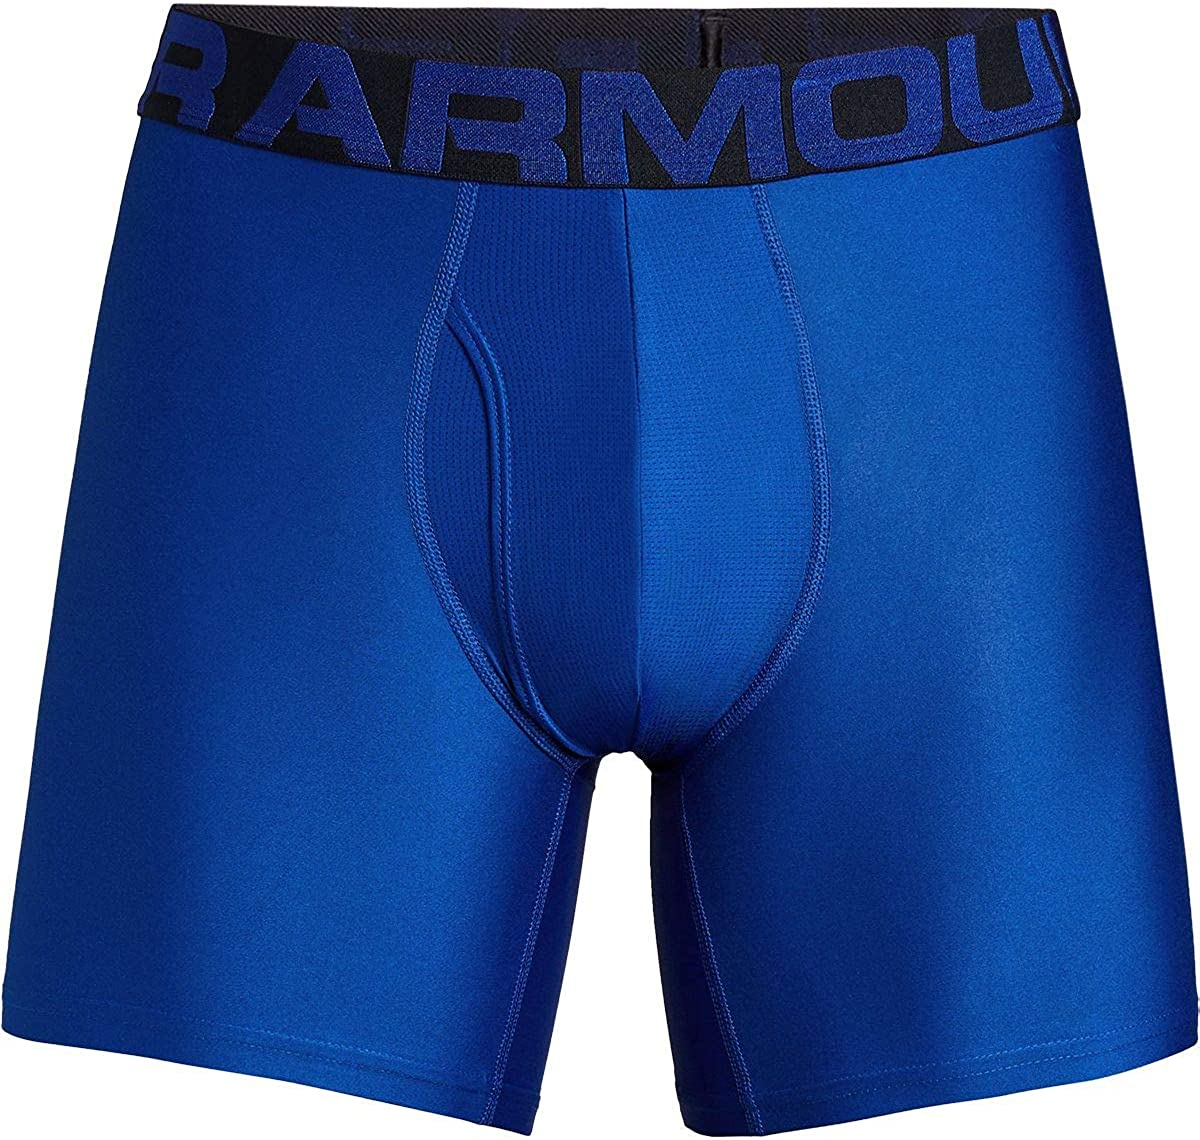 Saco Armonía cubo  Amazon.com: Under Armour Tech 6in Underwear - 2-Pack - Men's Royal/Academy,  XXL: Clothing